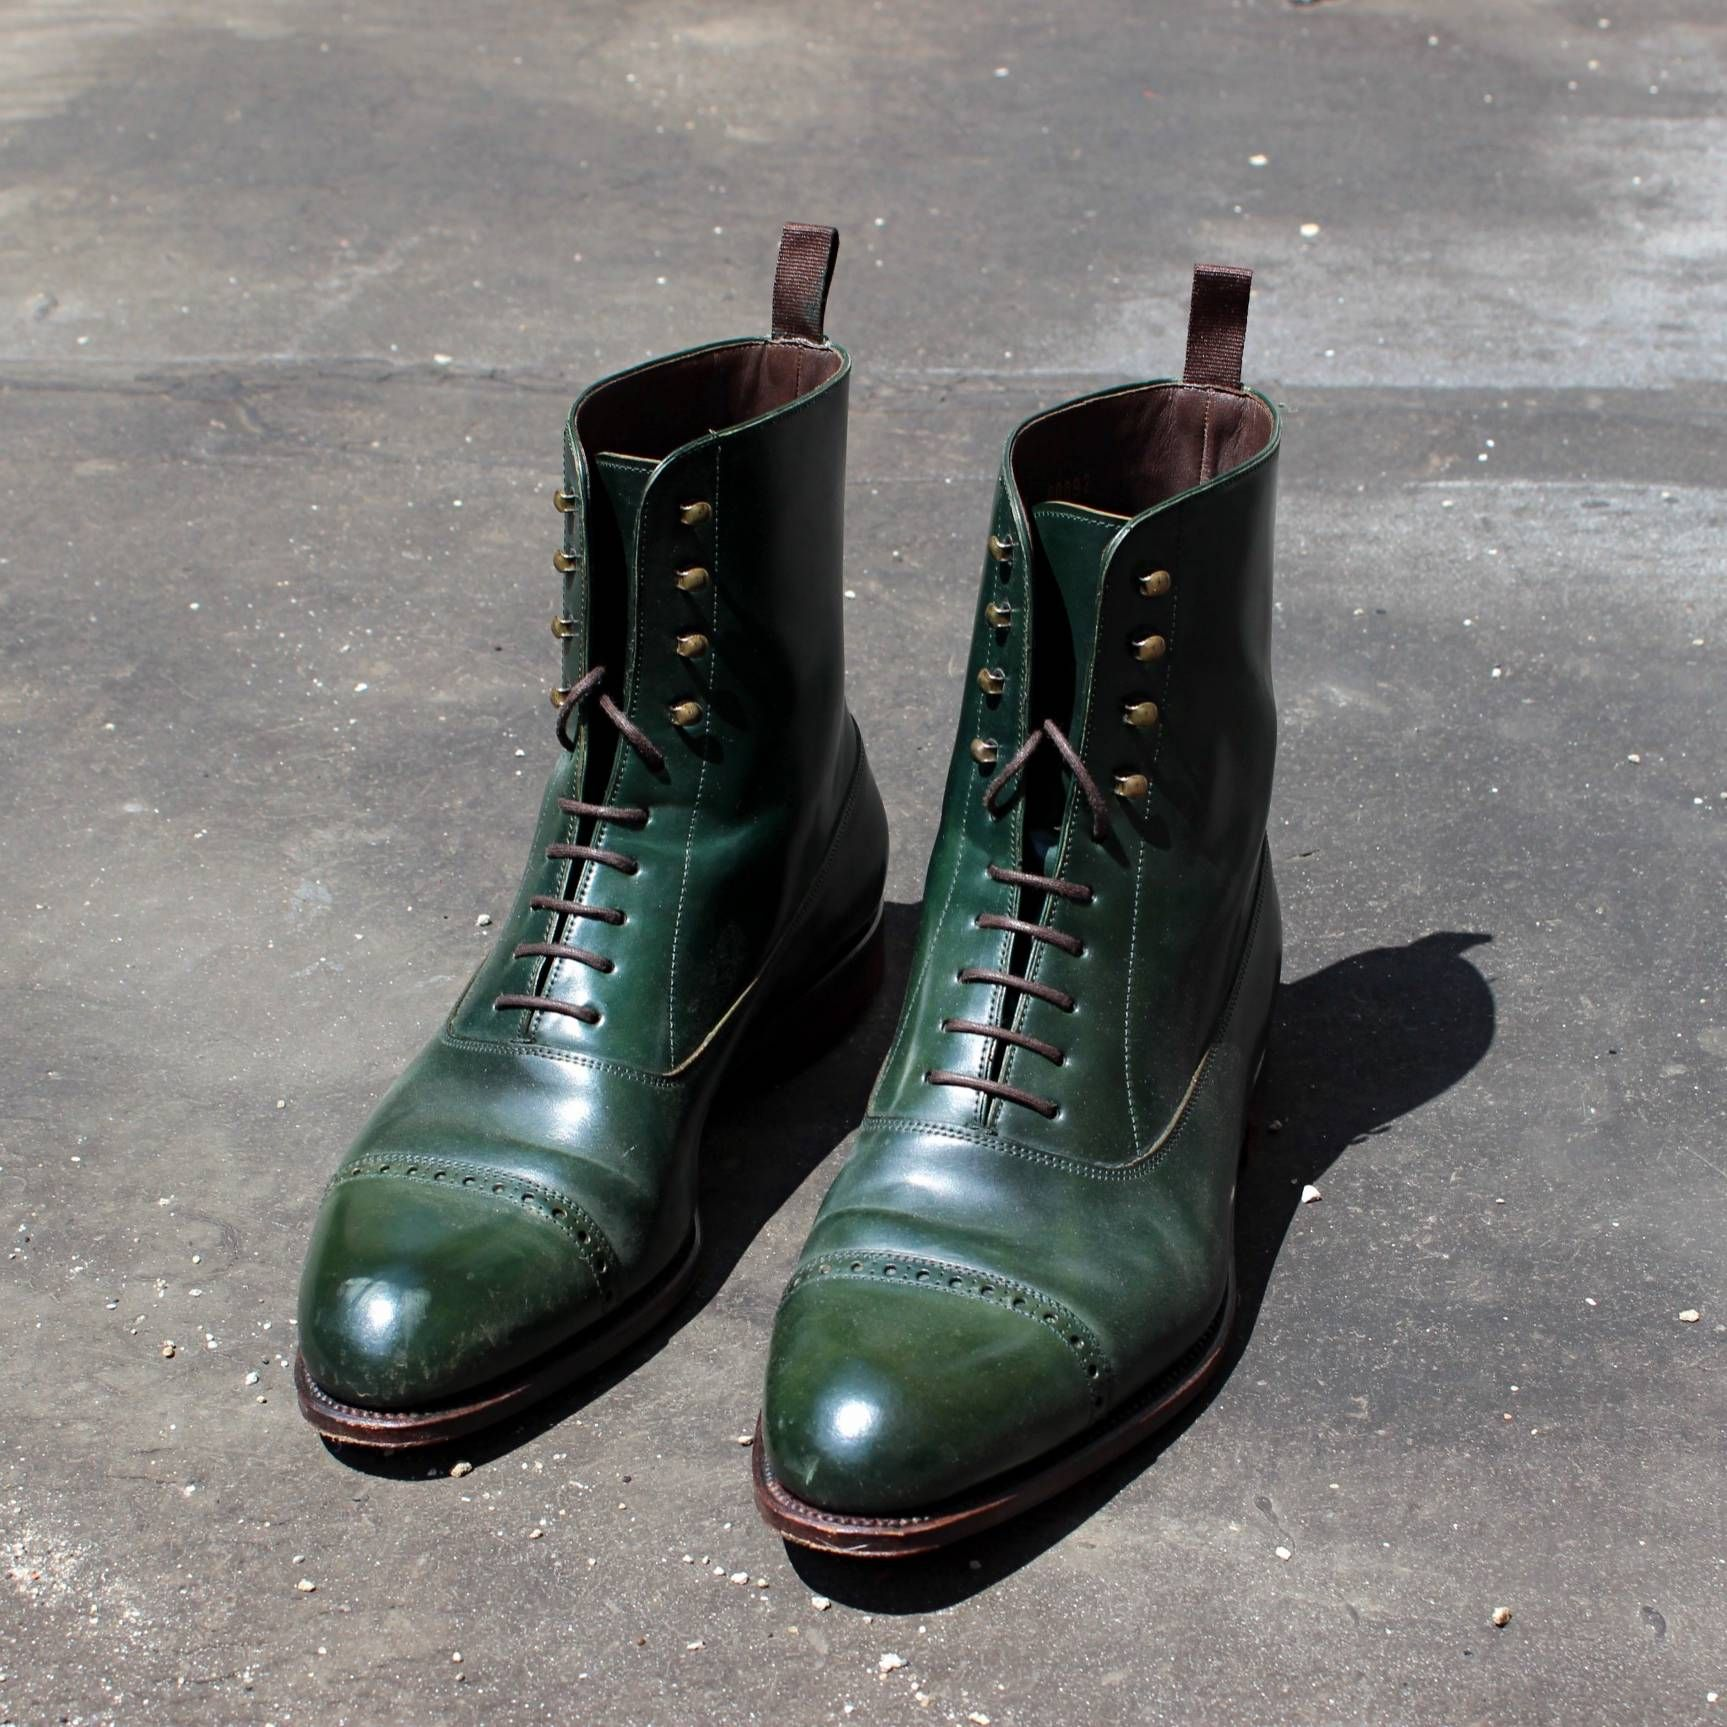 f4f1bce3b47 Carmina Loden Green Shell Cordovan Balmoral Boot | Balmoral Boots ...